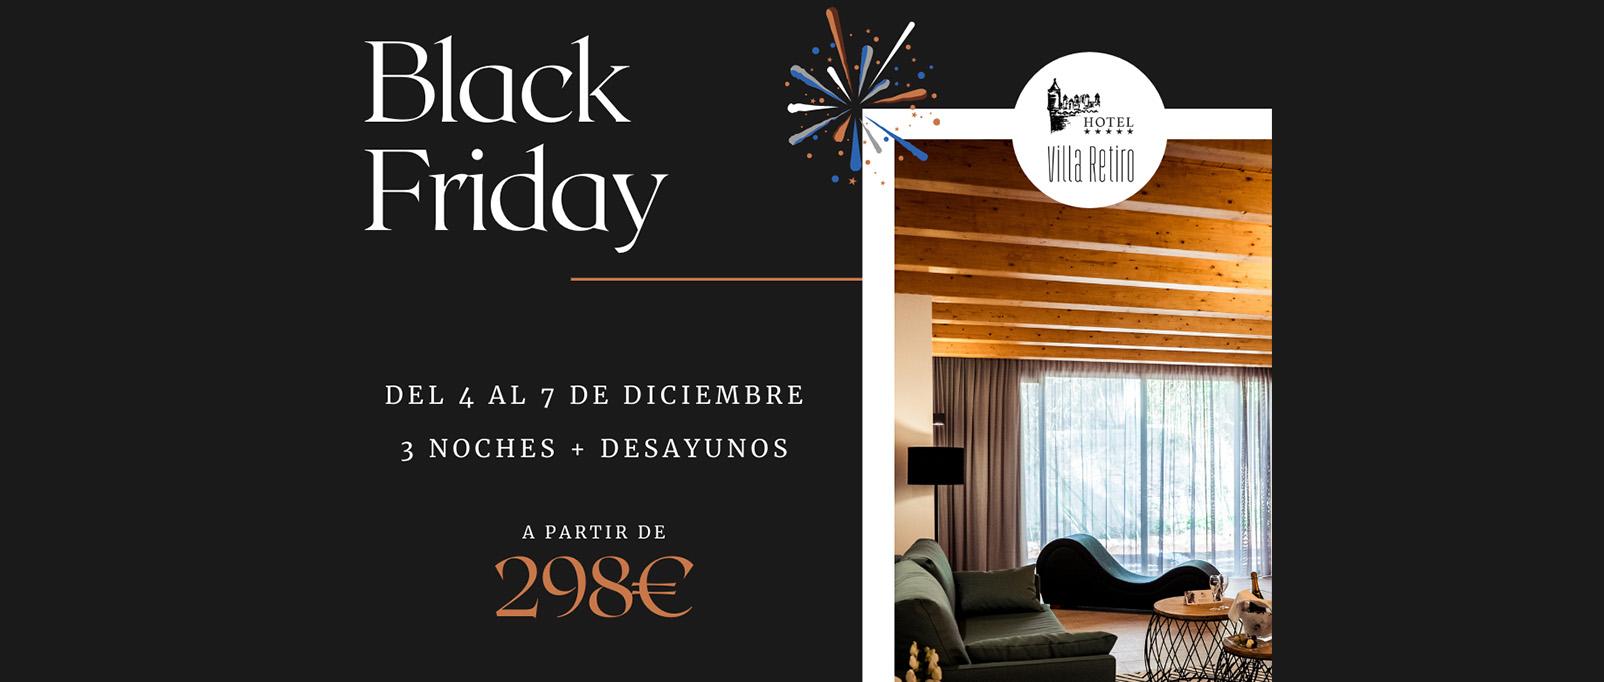 oferta-puente-constitucion-hotel-villa-retiro-black-friday